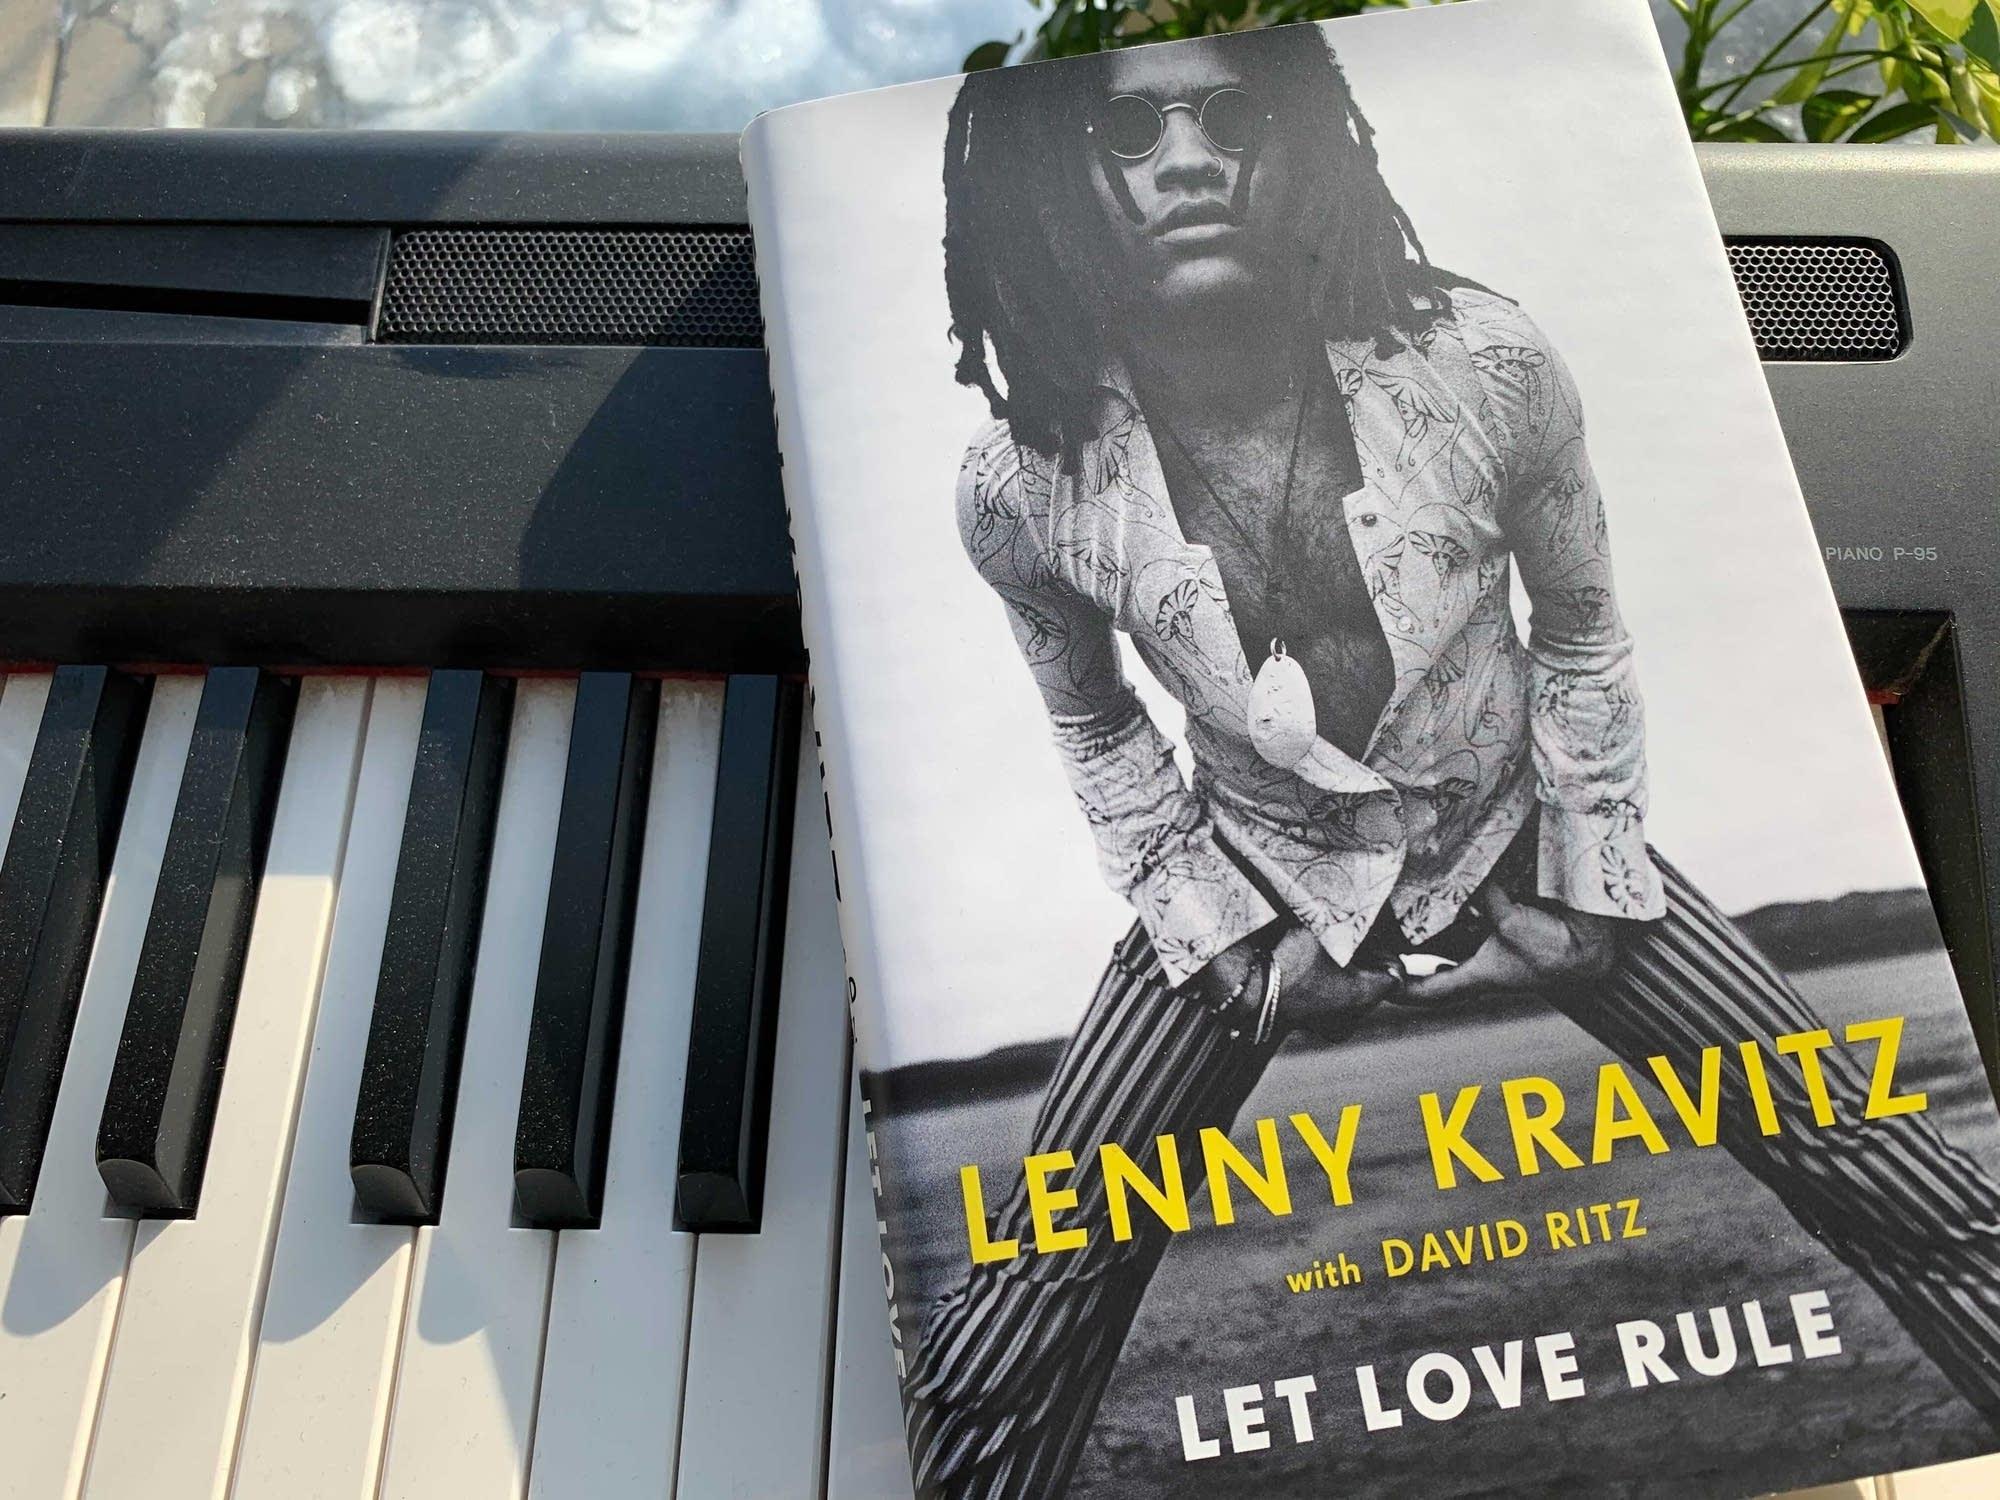 Lenny Kravitz's book 'Let Love Rule.'